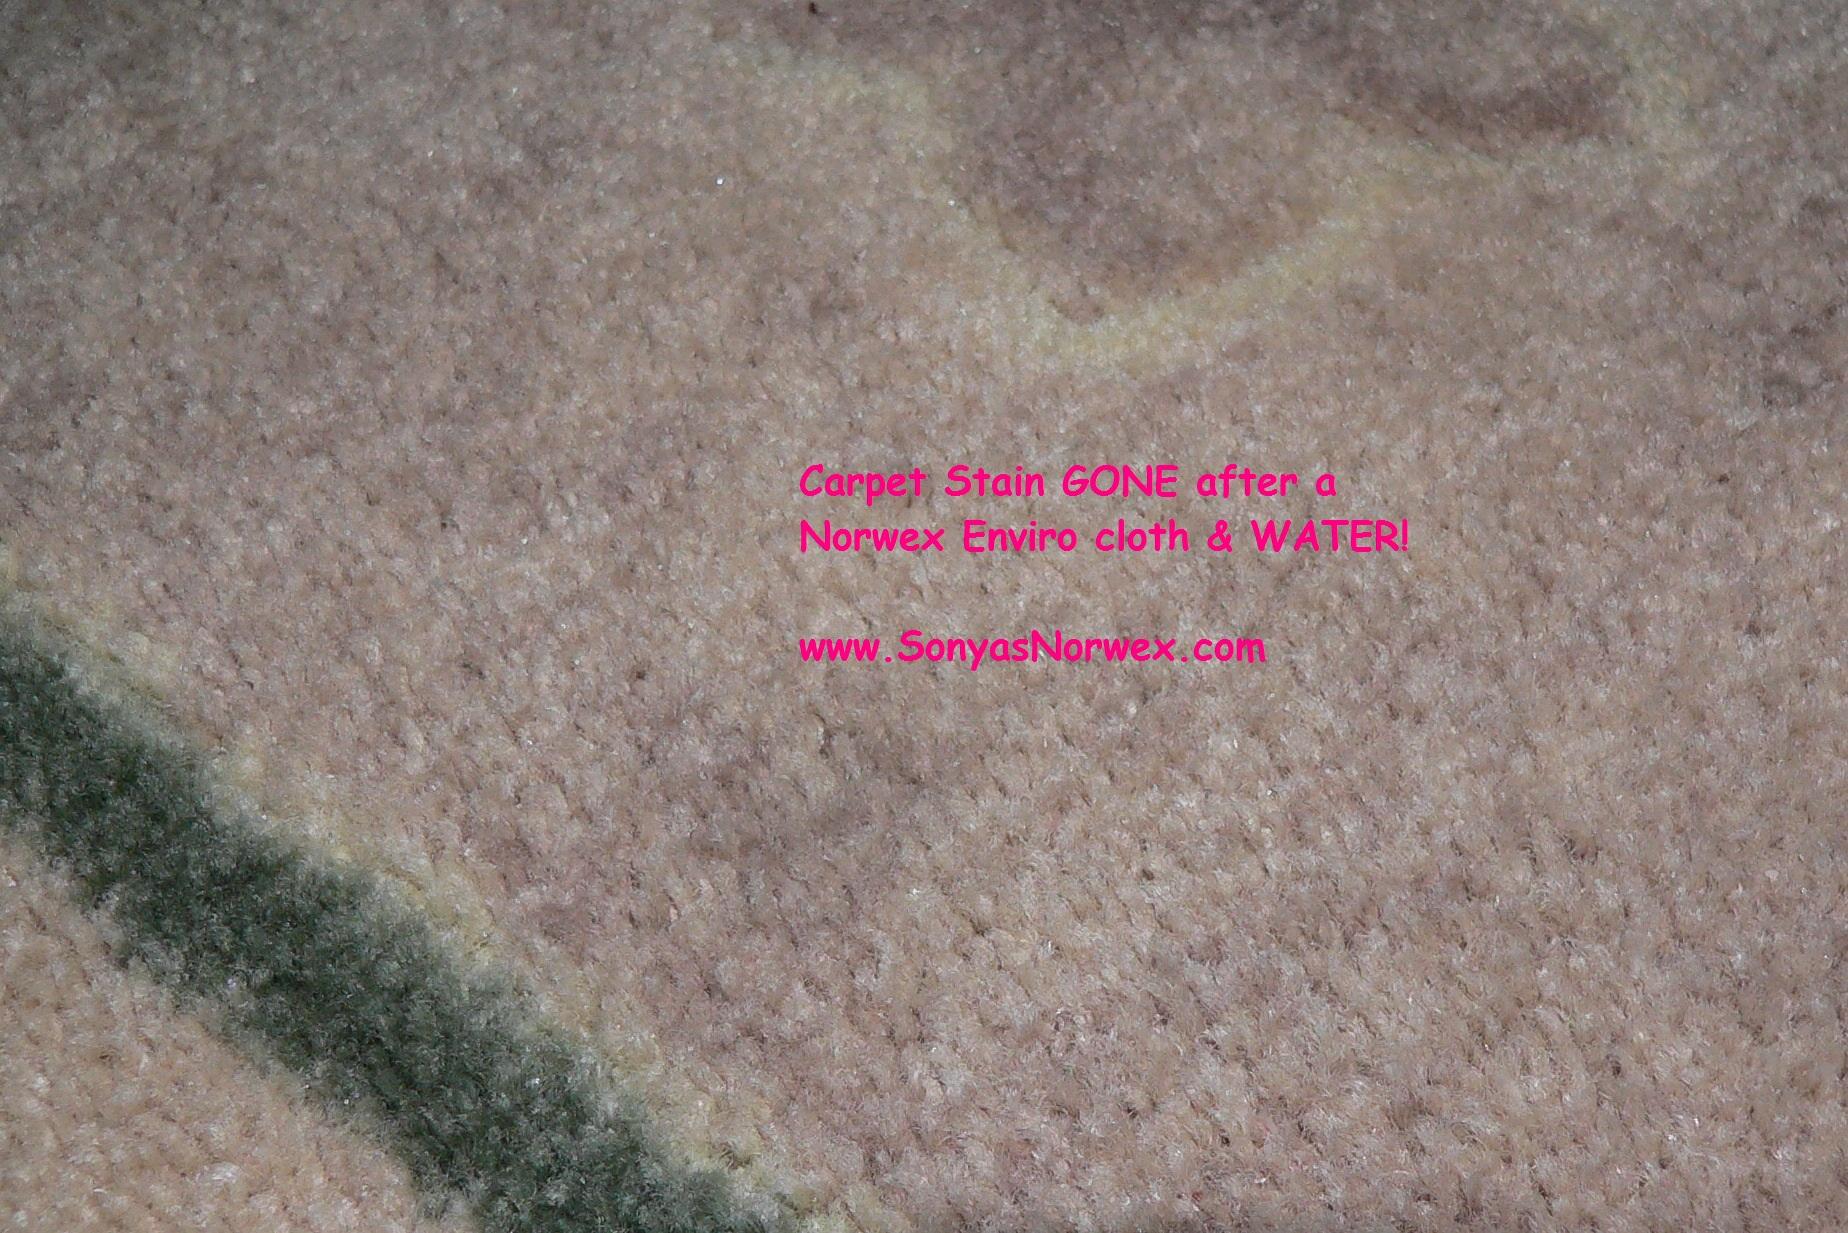 Norwex Cloth | Sonya Eckel's Norwex Blog